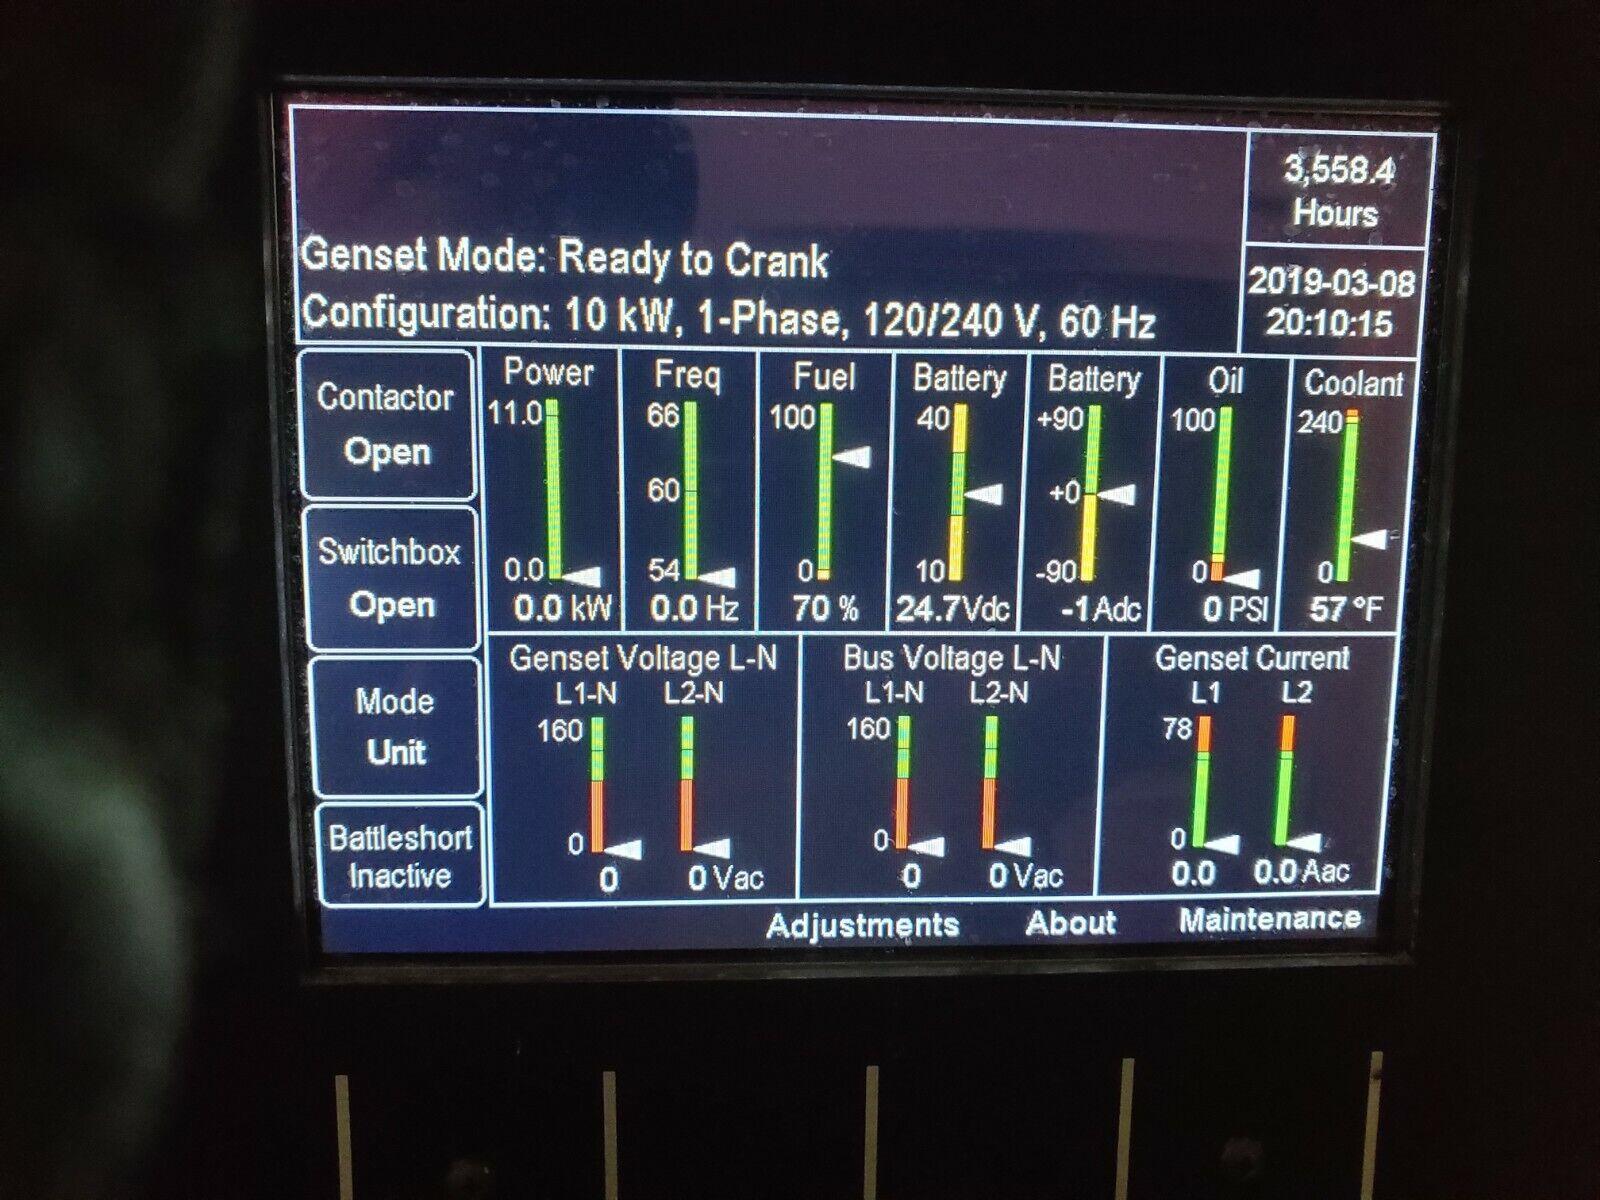 Cummins MEP-1040 AMMPS 10KW Tactical Military Diesel Generator 60HZ  MEP-803a | Shopping Bin - Search eBay faster